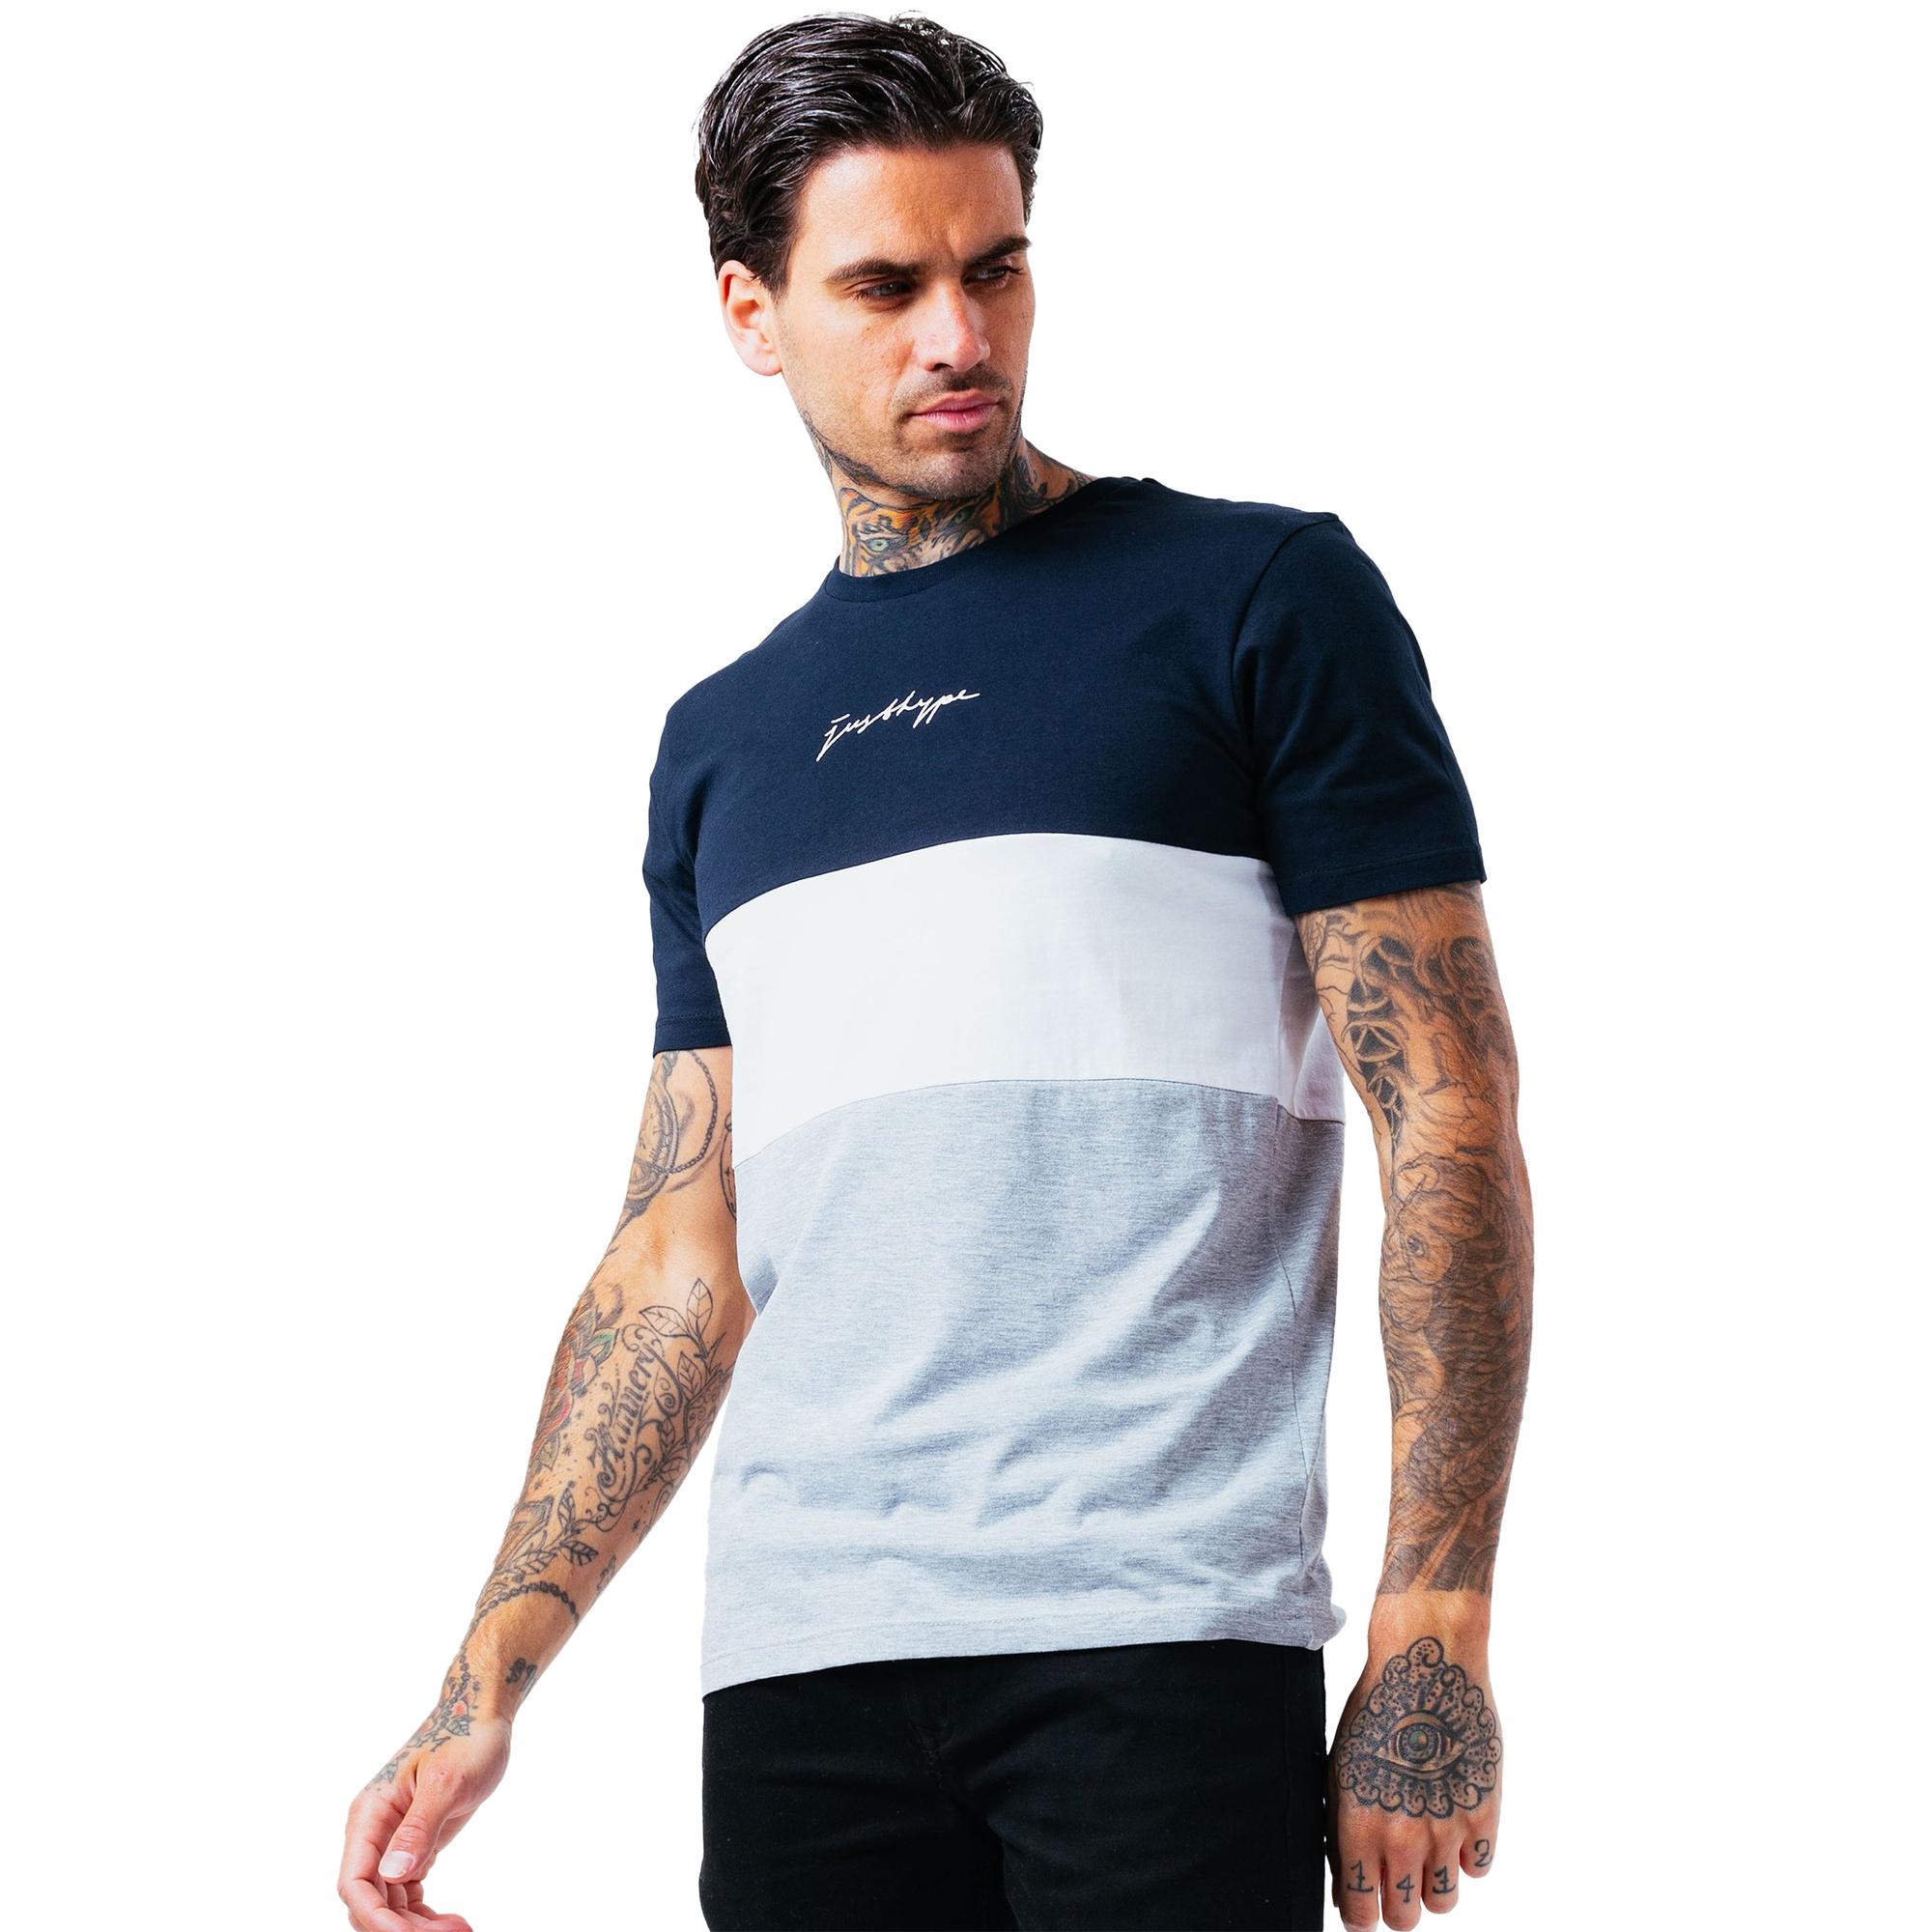 Hype Mens Aldgate T-Shirt (XS) (Grey/Navy/White)